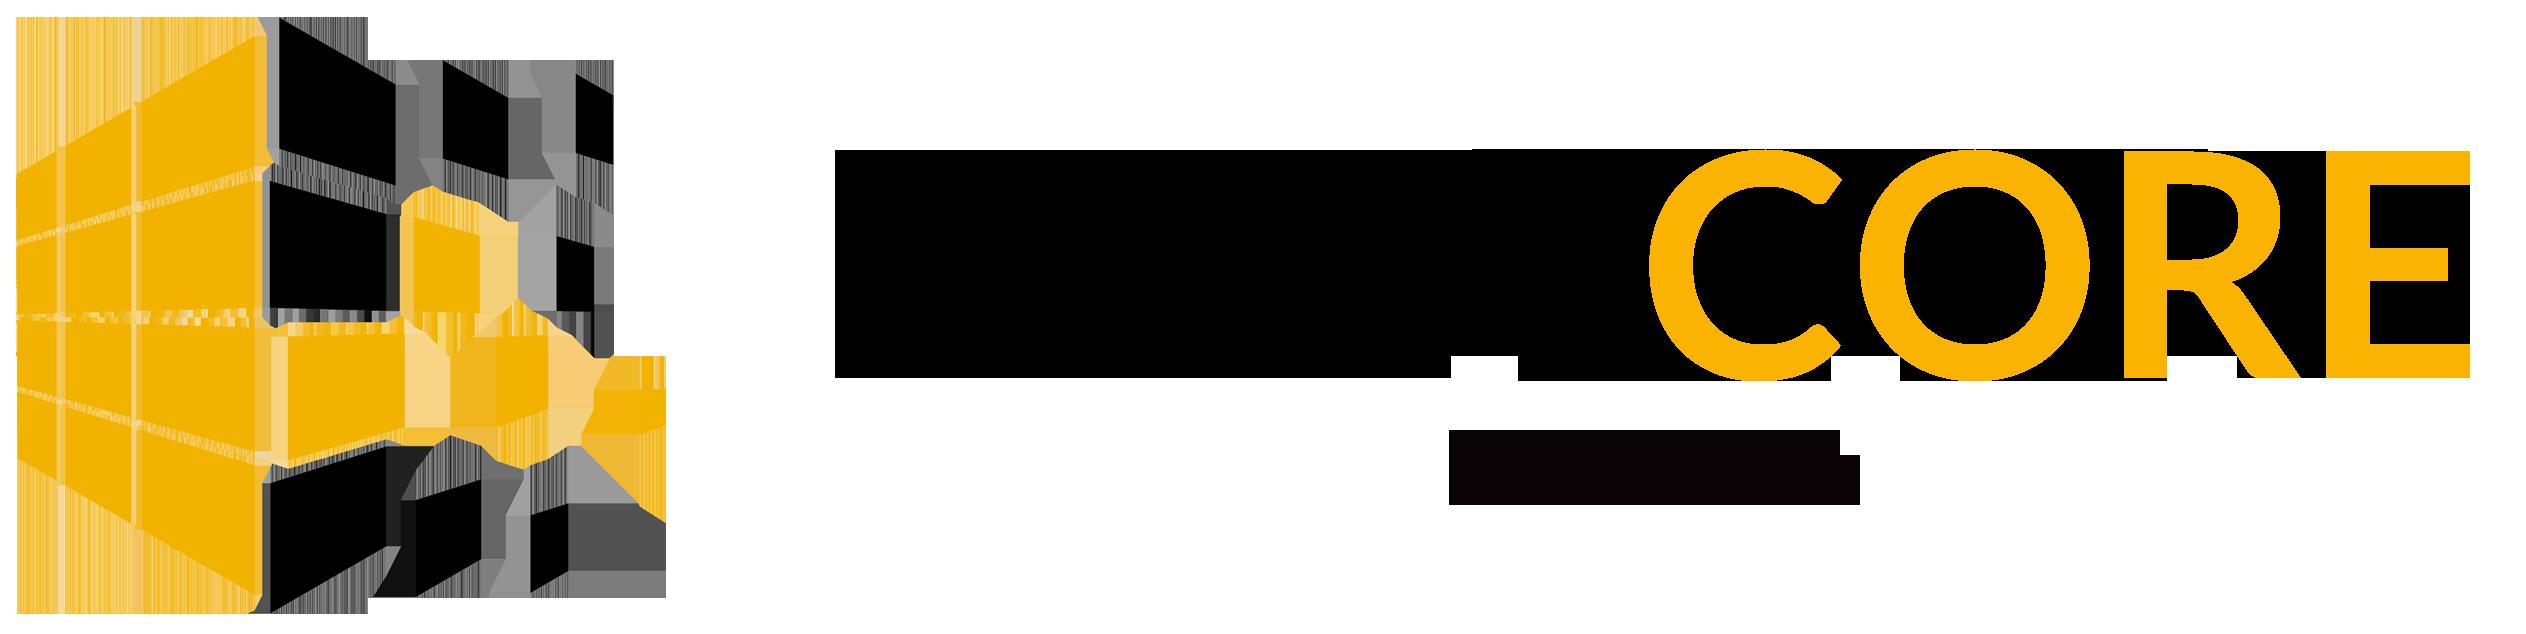 https://nextcoremedia.com/wp-content/uploads/2018/04/NextCore-Media-Full-Logo-Left-Side-flat-left.png